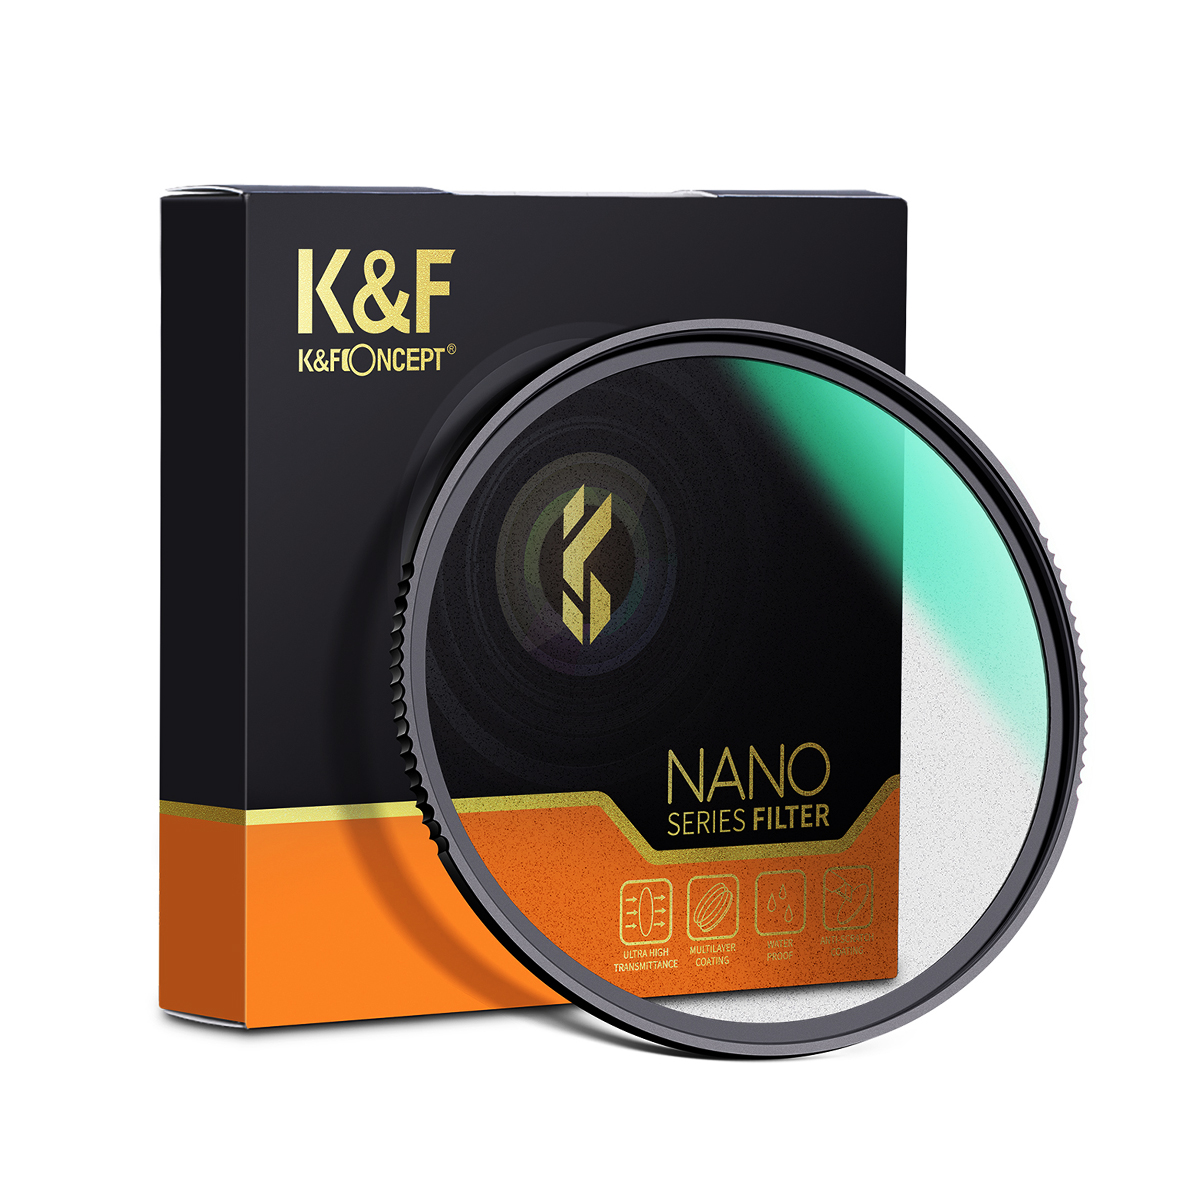 K&F Concept NANO-X ブラックディフュージョン 1/2 フィルター KF- (49-82) BD1/2 (ブラックミスト)